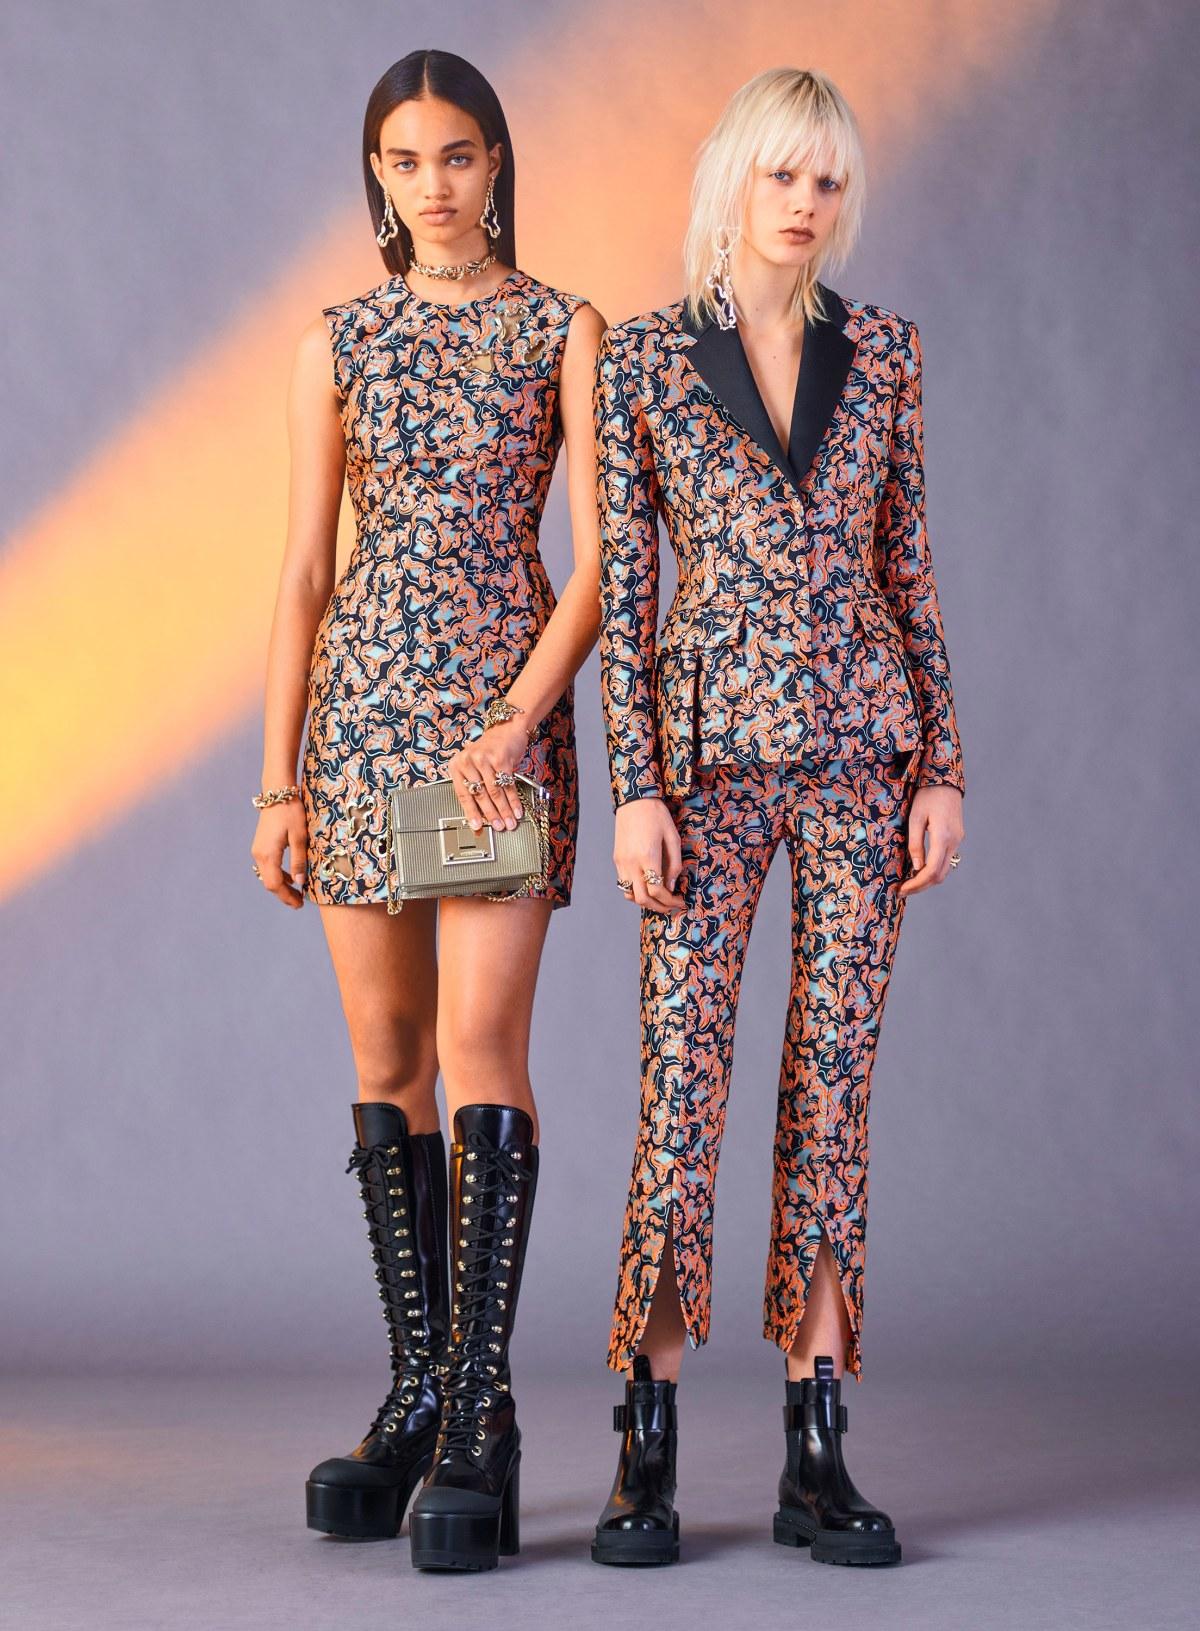 versace-pre-fall-2017-fashion-show-the-impression-36